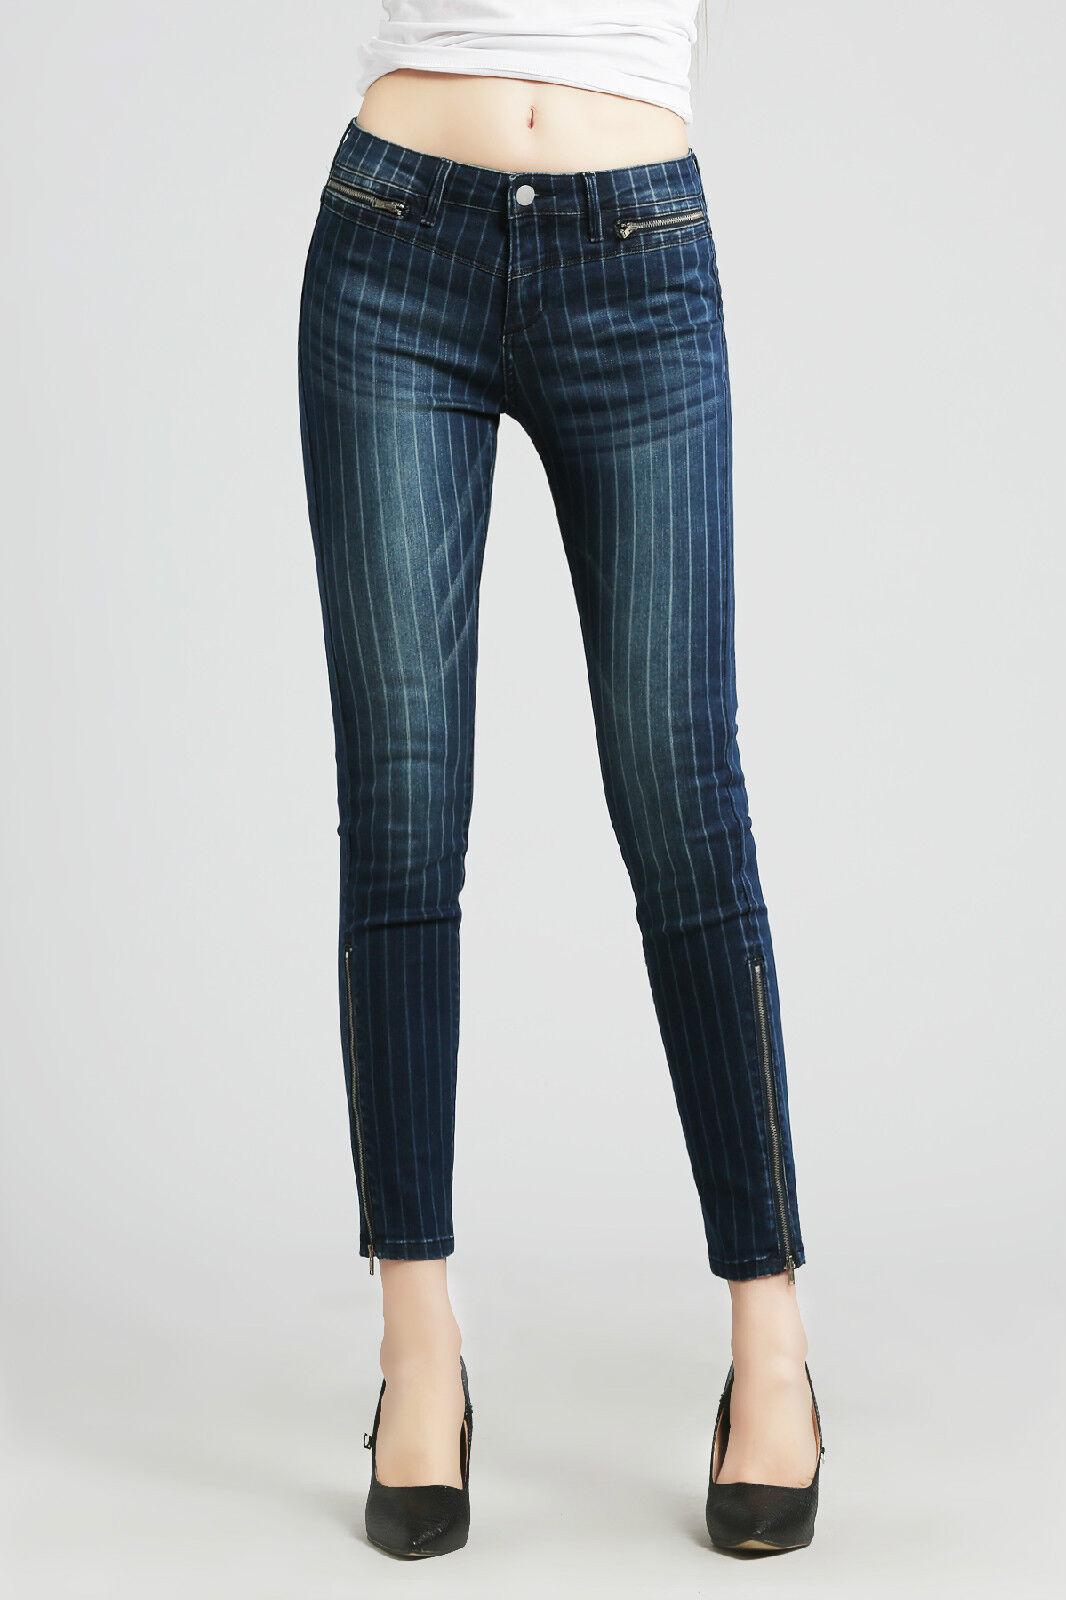 Women Denim Laser Printed Zip Skinny Jeans Stretch Pants Low Rise Slim Size 28